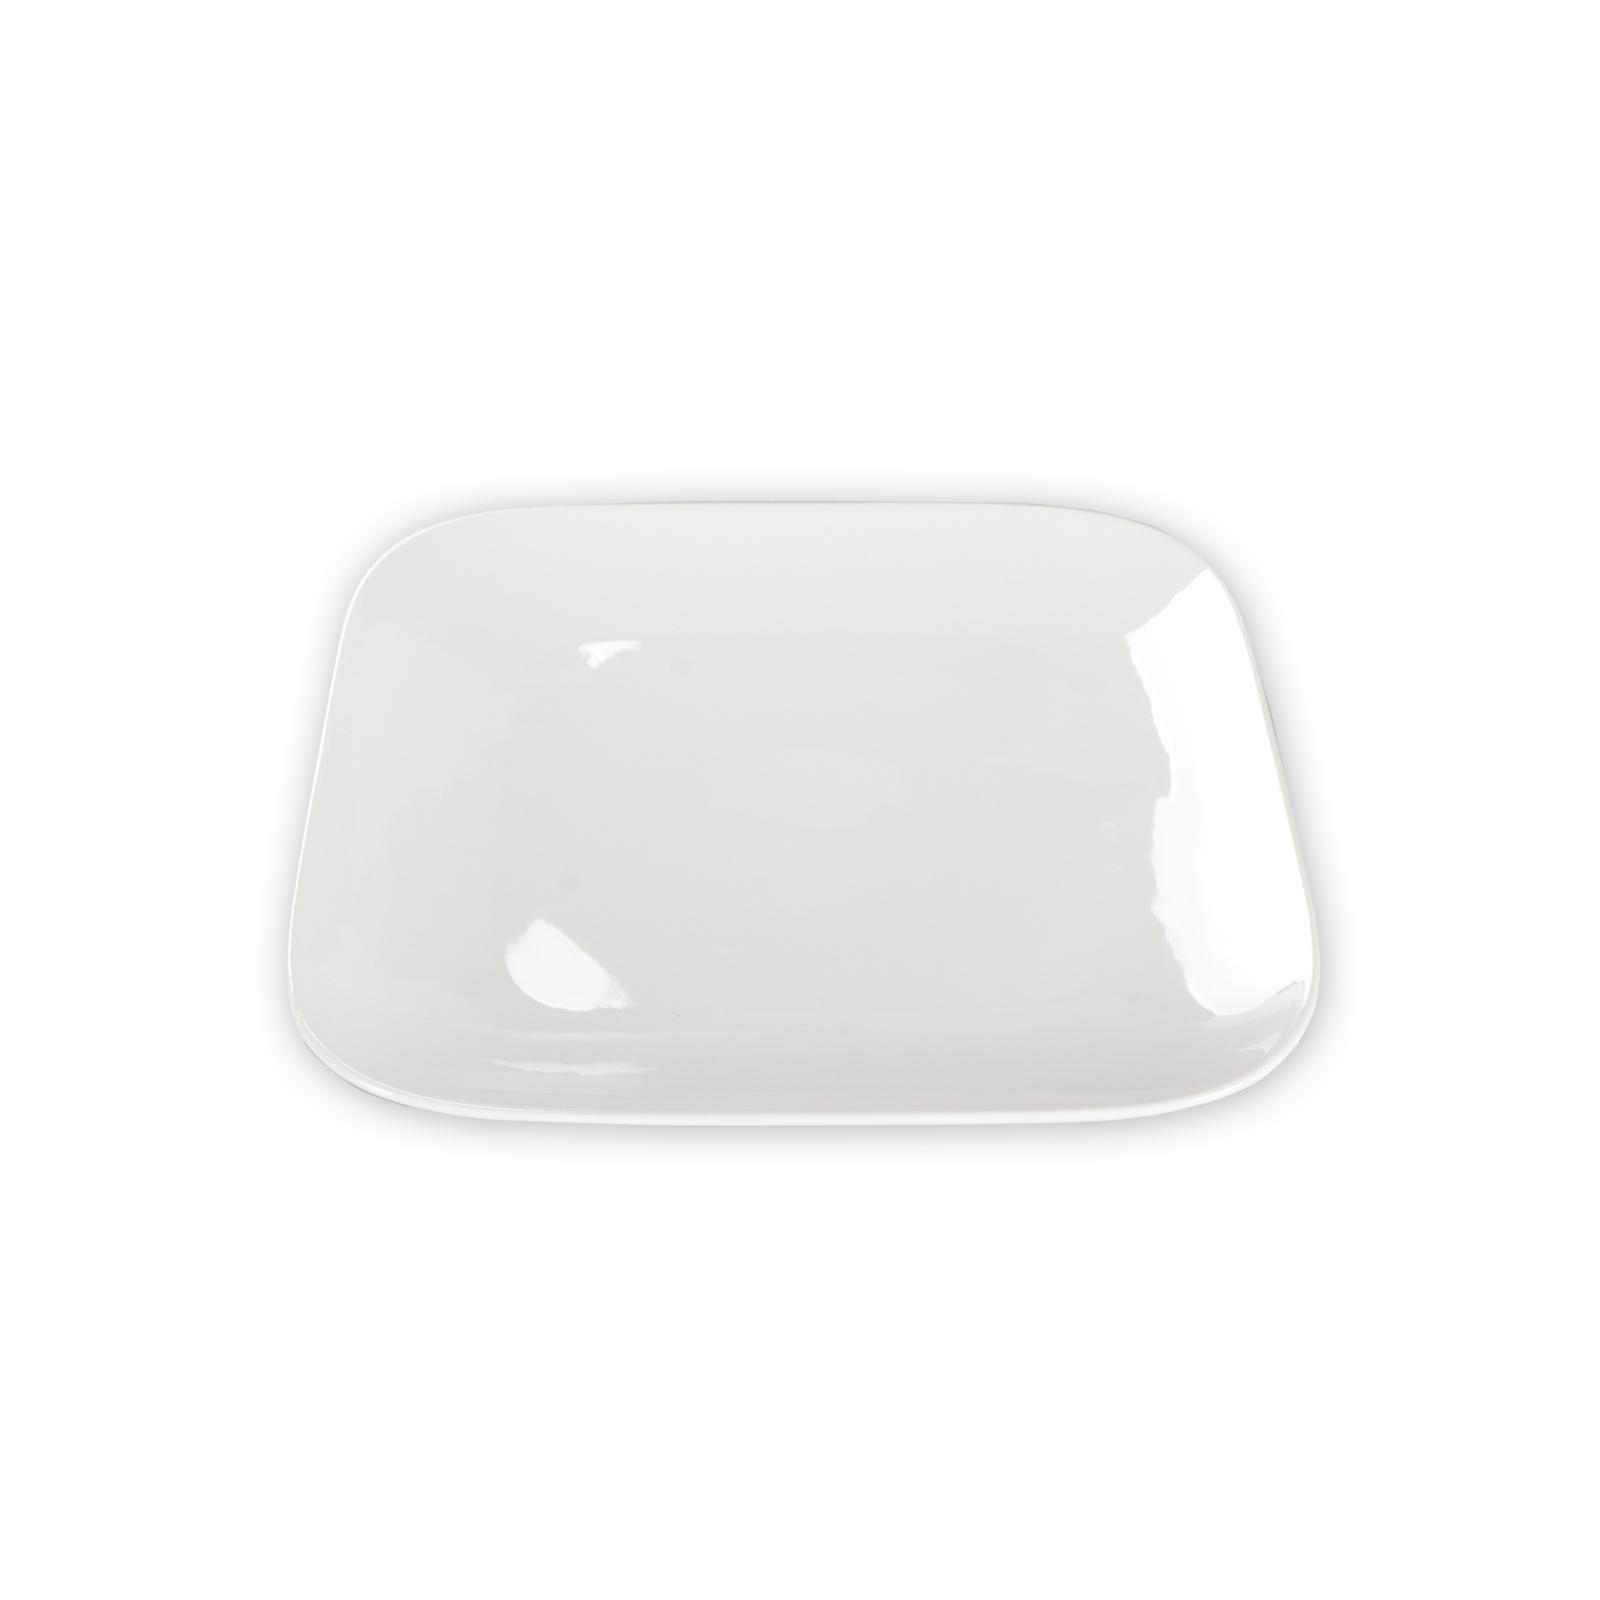 16 tlg geschirrserie 39 new bone china 39 geschirrset geschirr porzellan service ebay. Black Bedroom Furniture Sets. Home Design Ideas